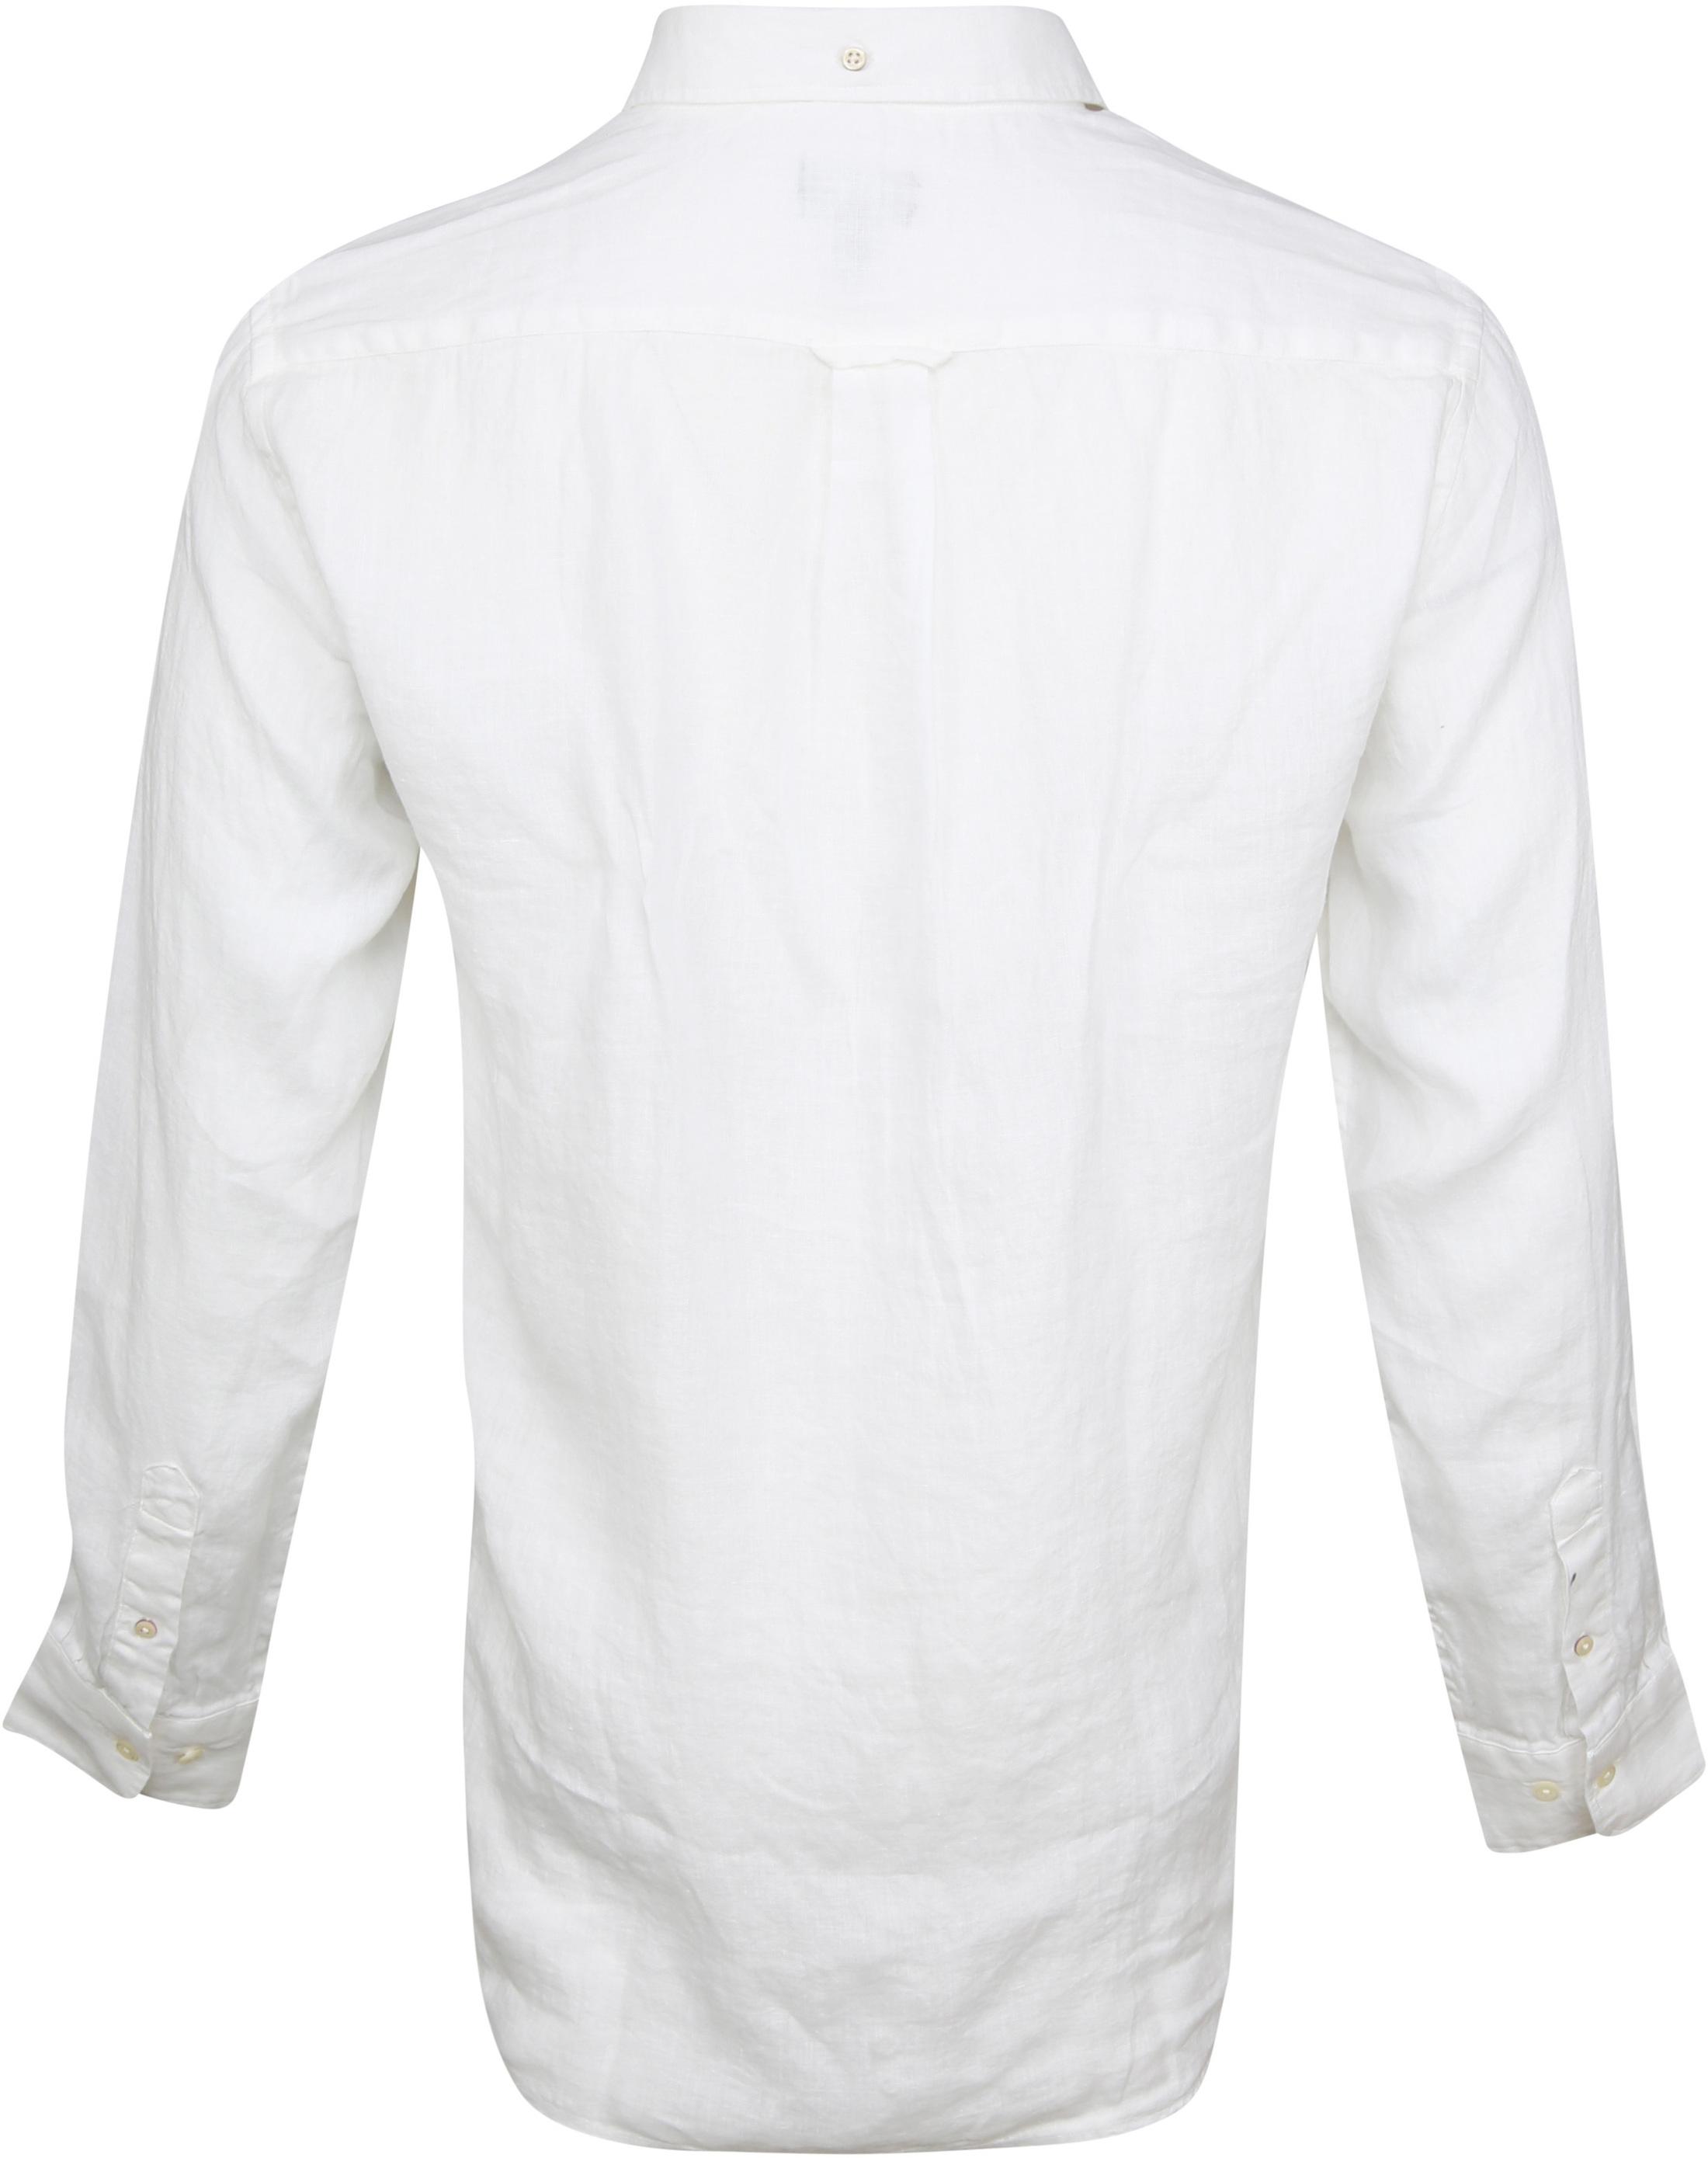 Gant Casual Overhemd Linnen Wit foto 3